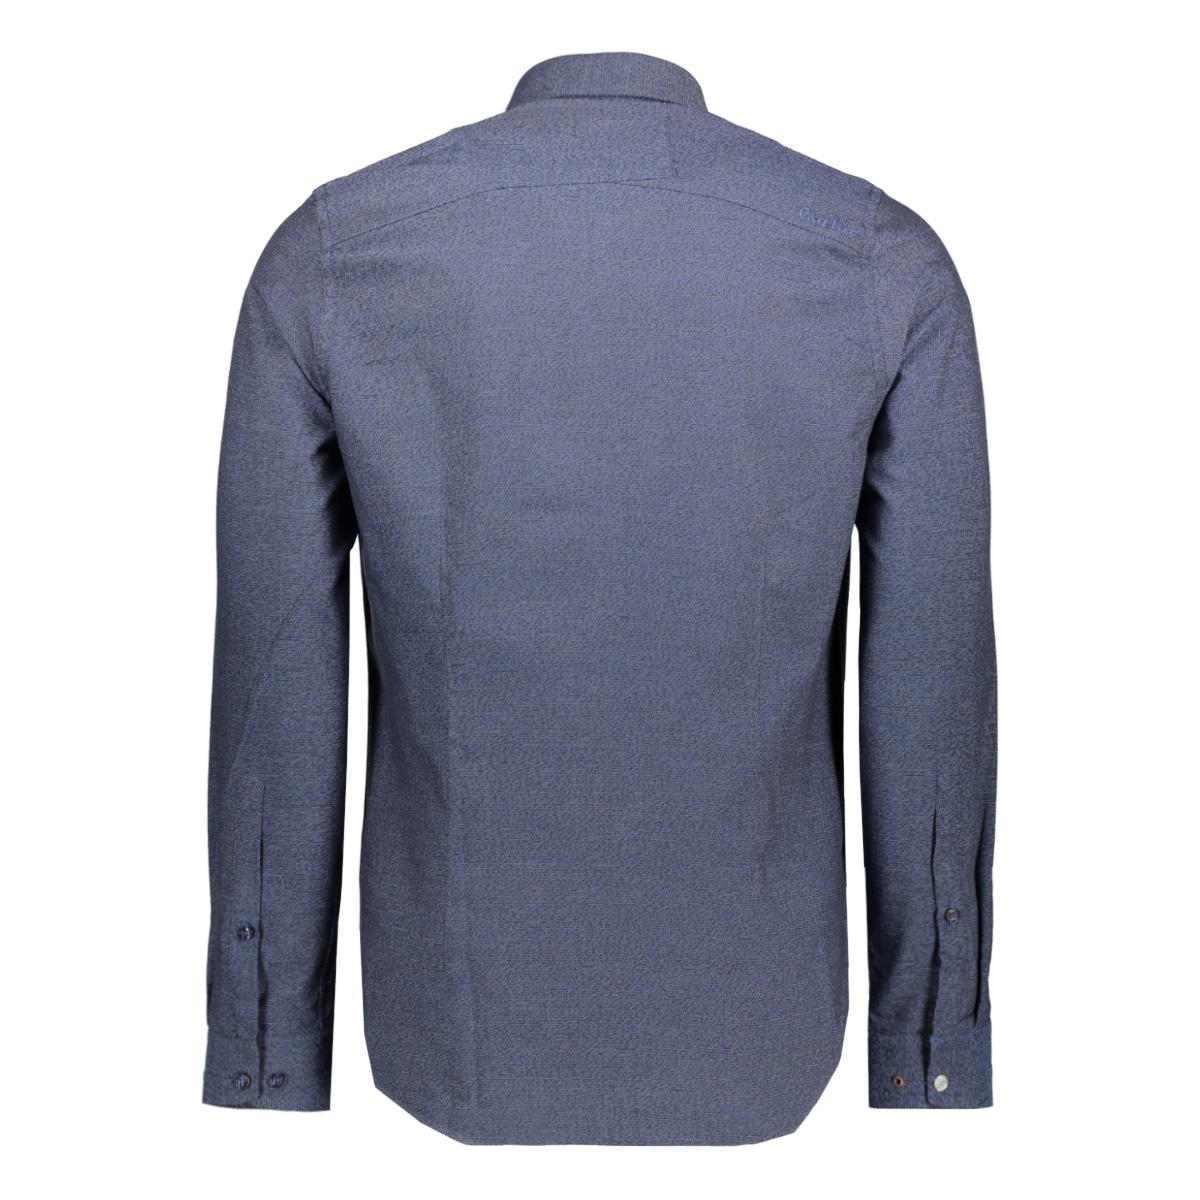 csi176637 cast iron overhemd 5260